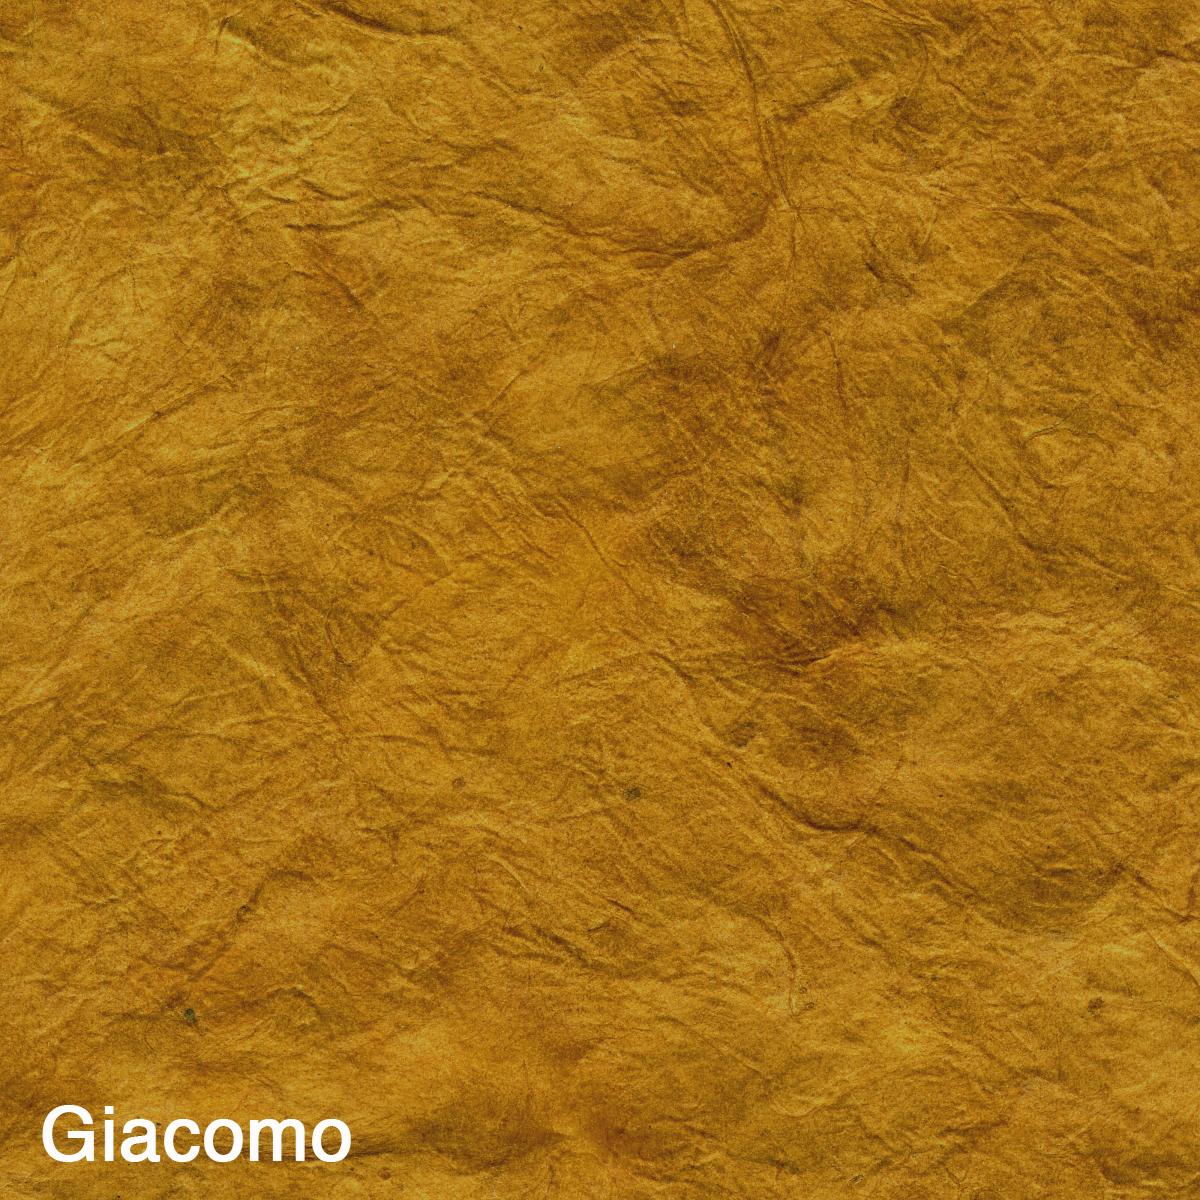 Giacomo001.jpg